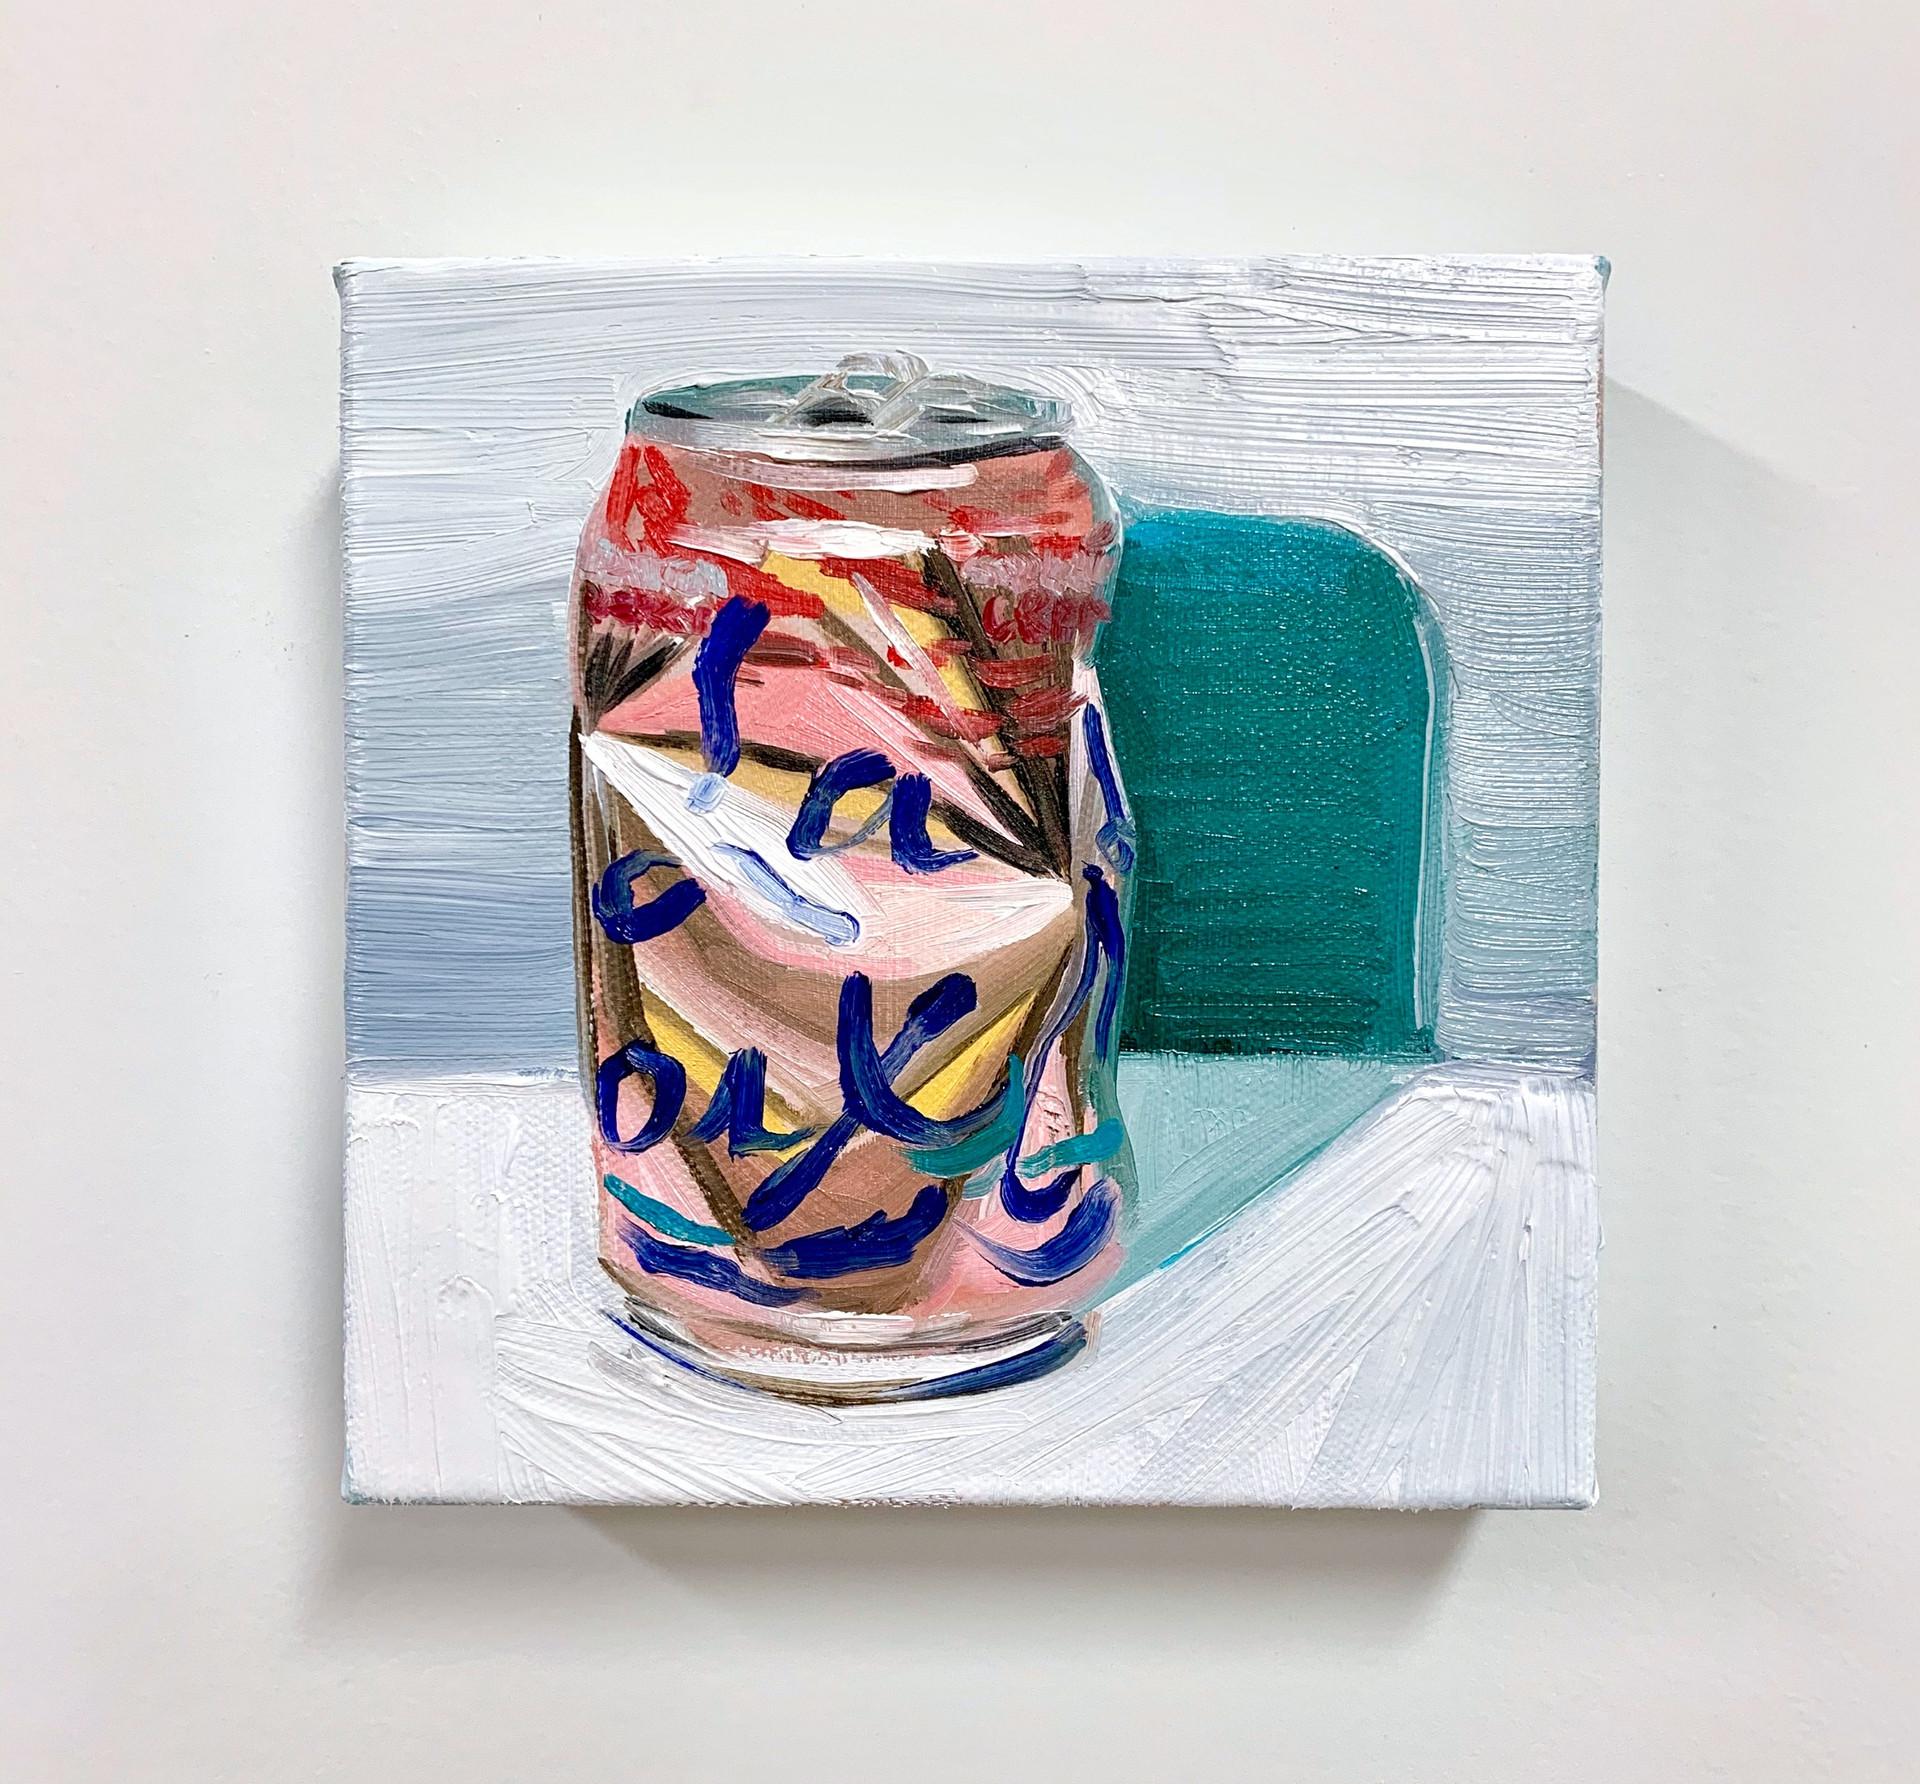 """La Croix 1"", Crushed Series, 5"" x 5"", oil on canvas, 2020"